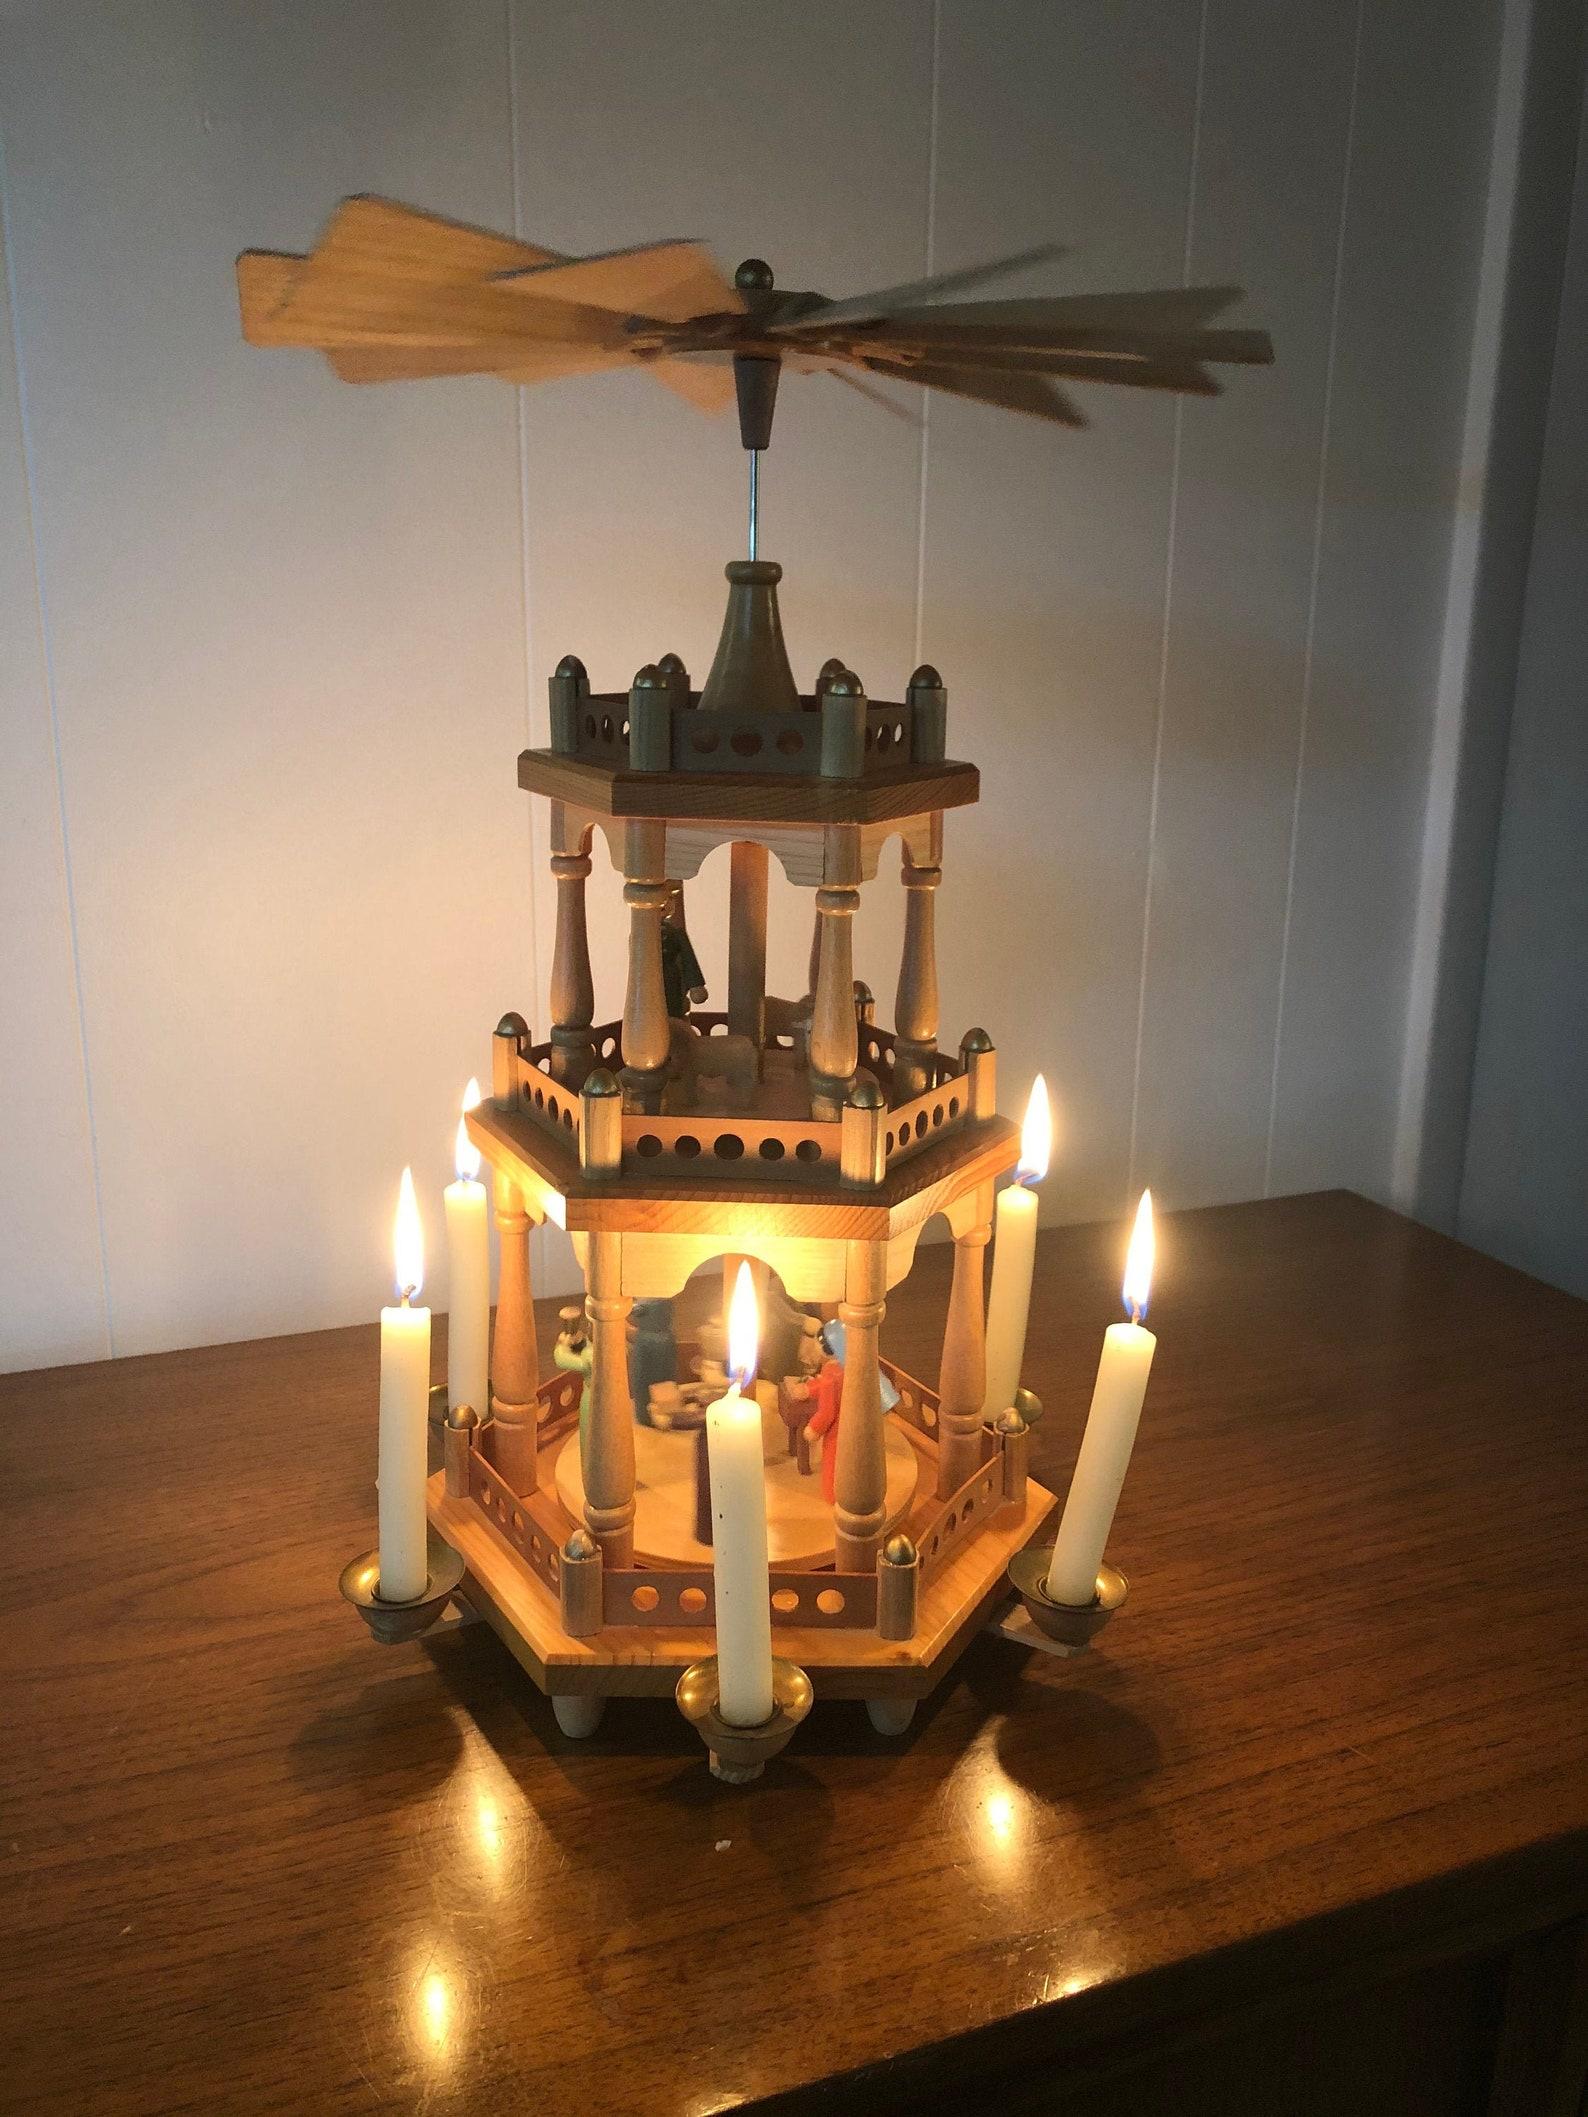 Vintage German Christmas Carousel, 3 Tier Christmas Pyramid Made in Germany,